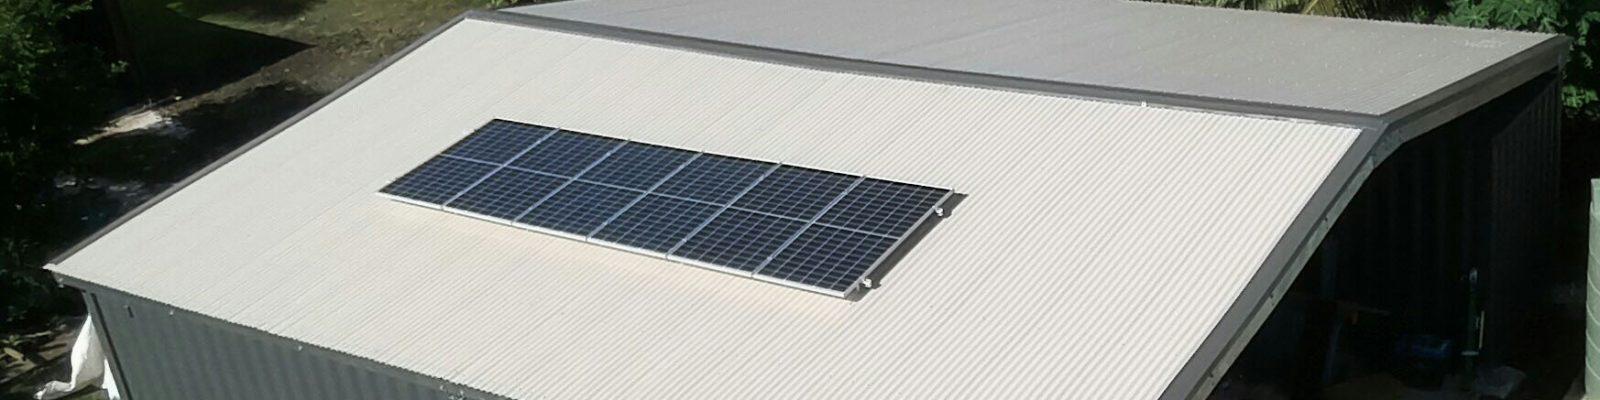 1.8kWp Offgrid Solar System in Utriki, Rotuma